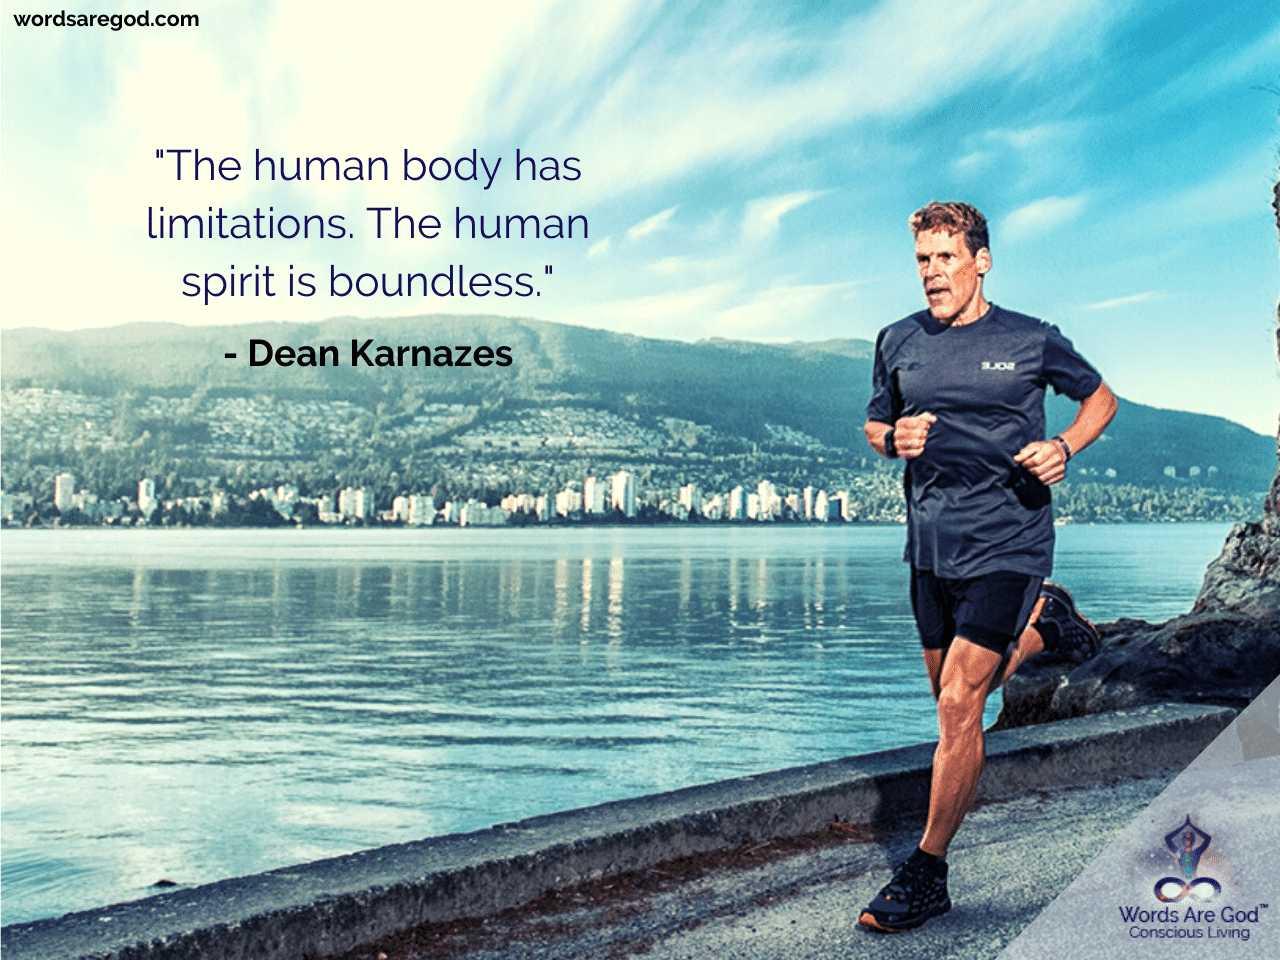 Dean Karnazes Motivational Quote by Dean Karnazes